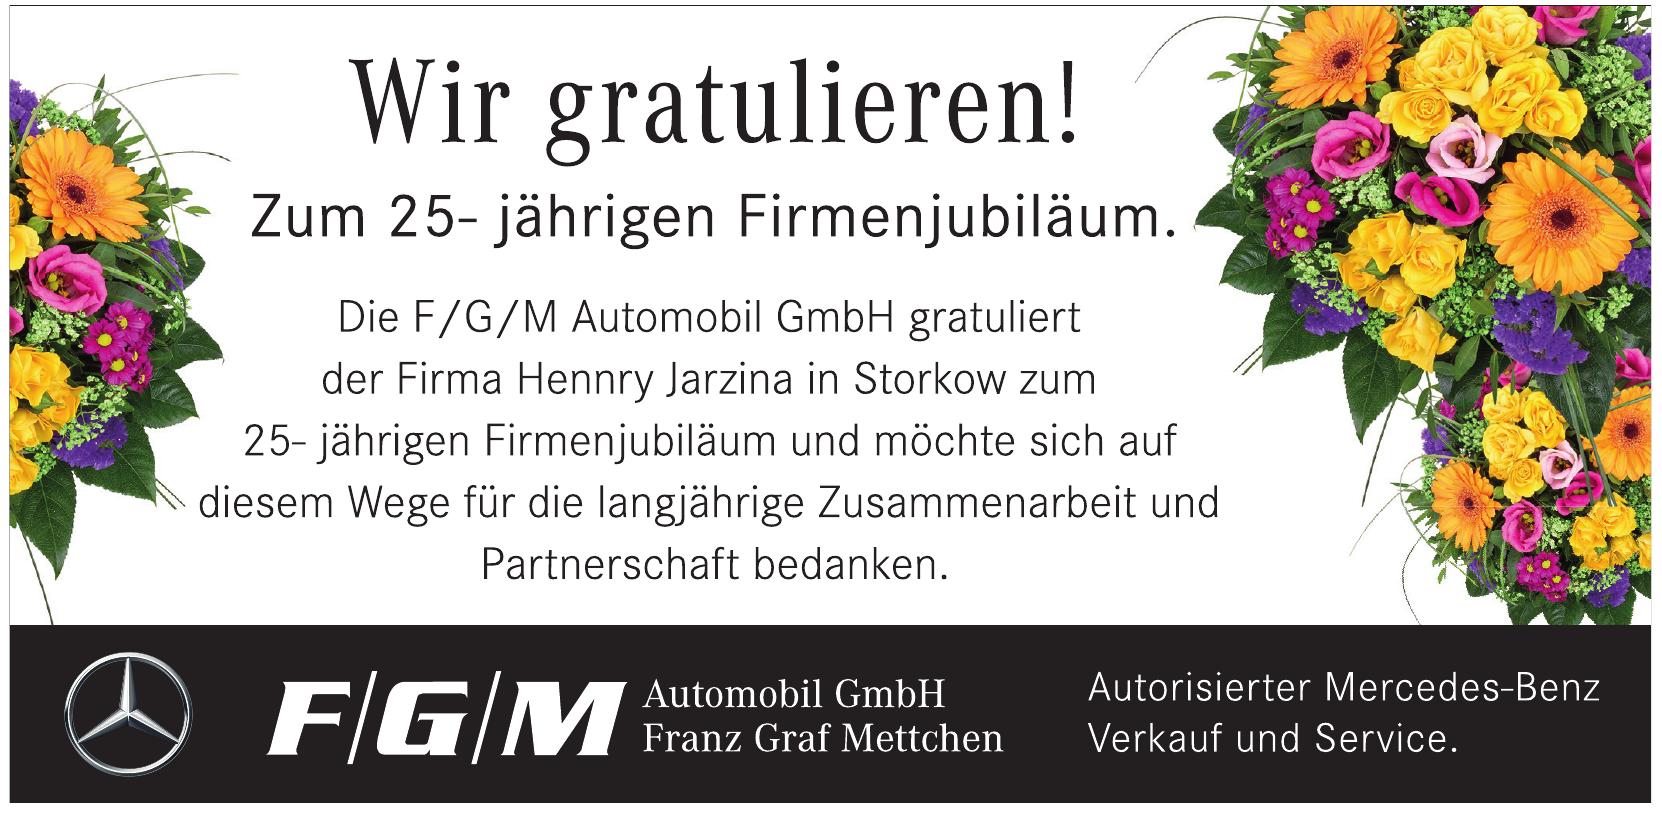 FGM Automobil GmbH